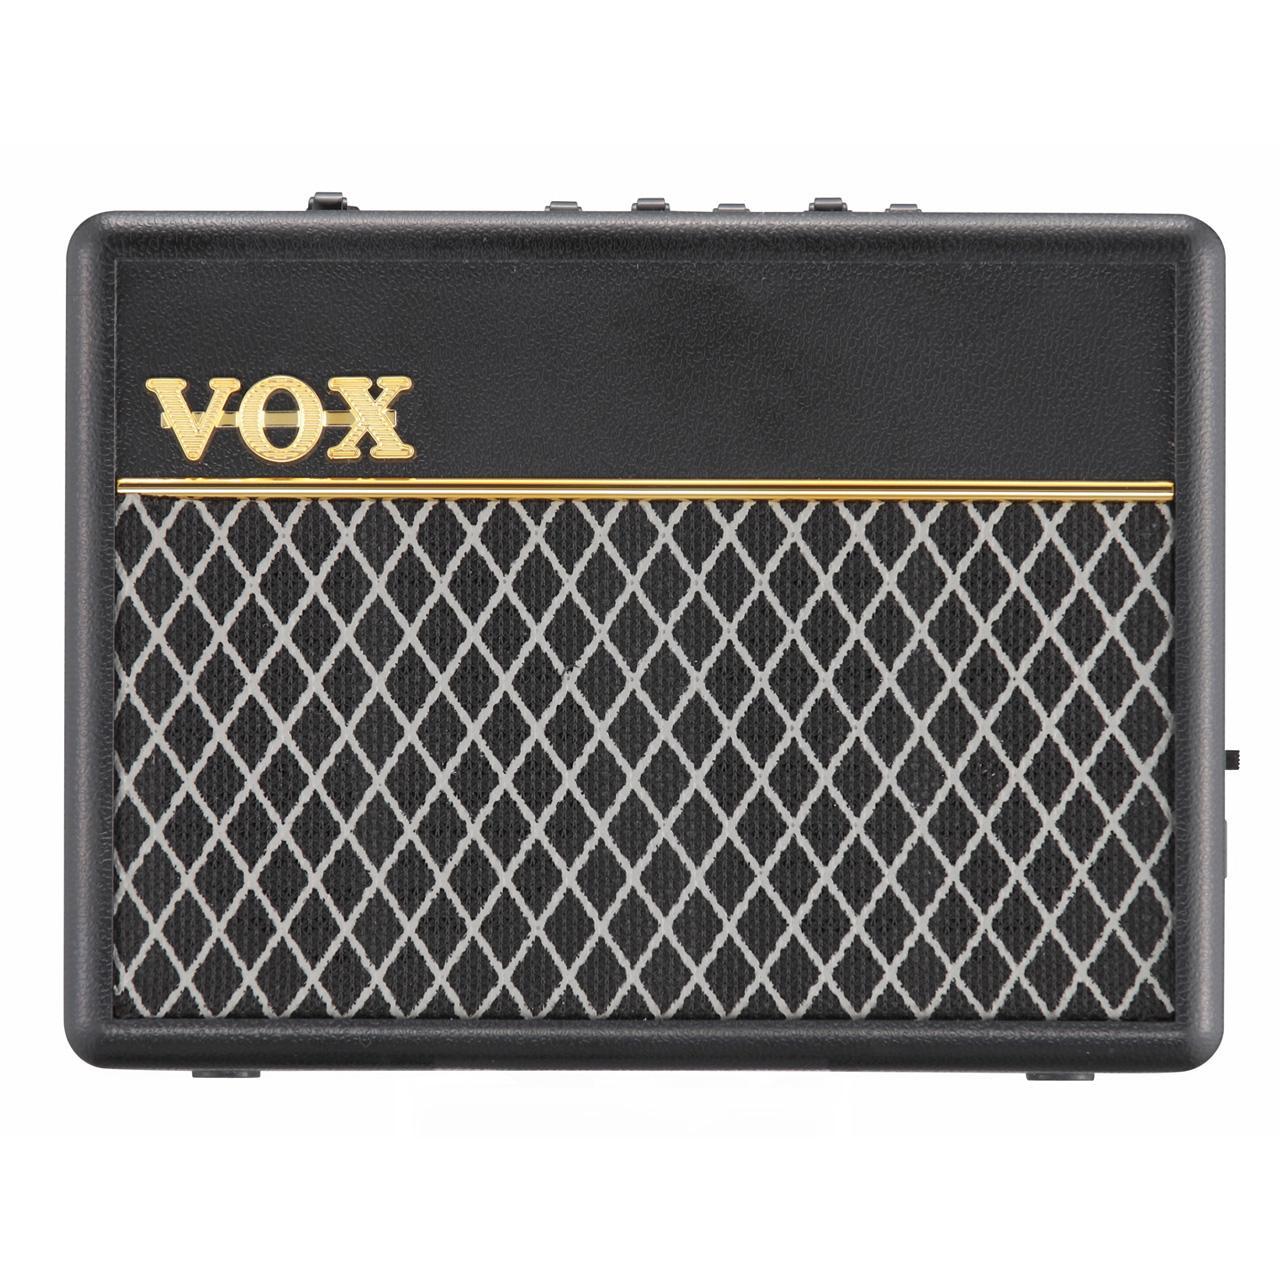 VOX AC1 Rhythm BASS | امپلی فایر باس همراه با ریتم |